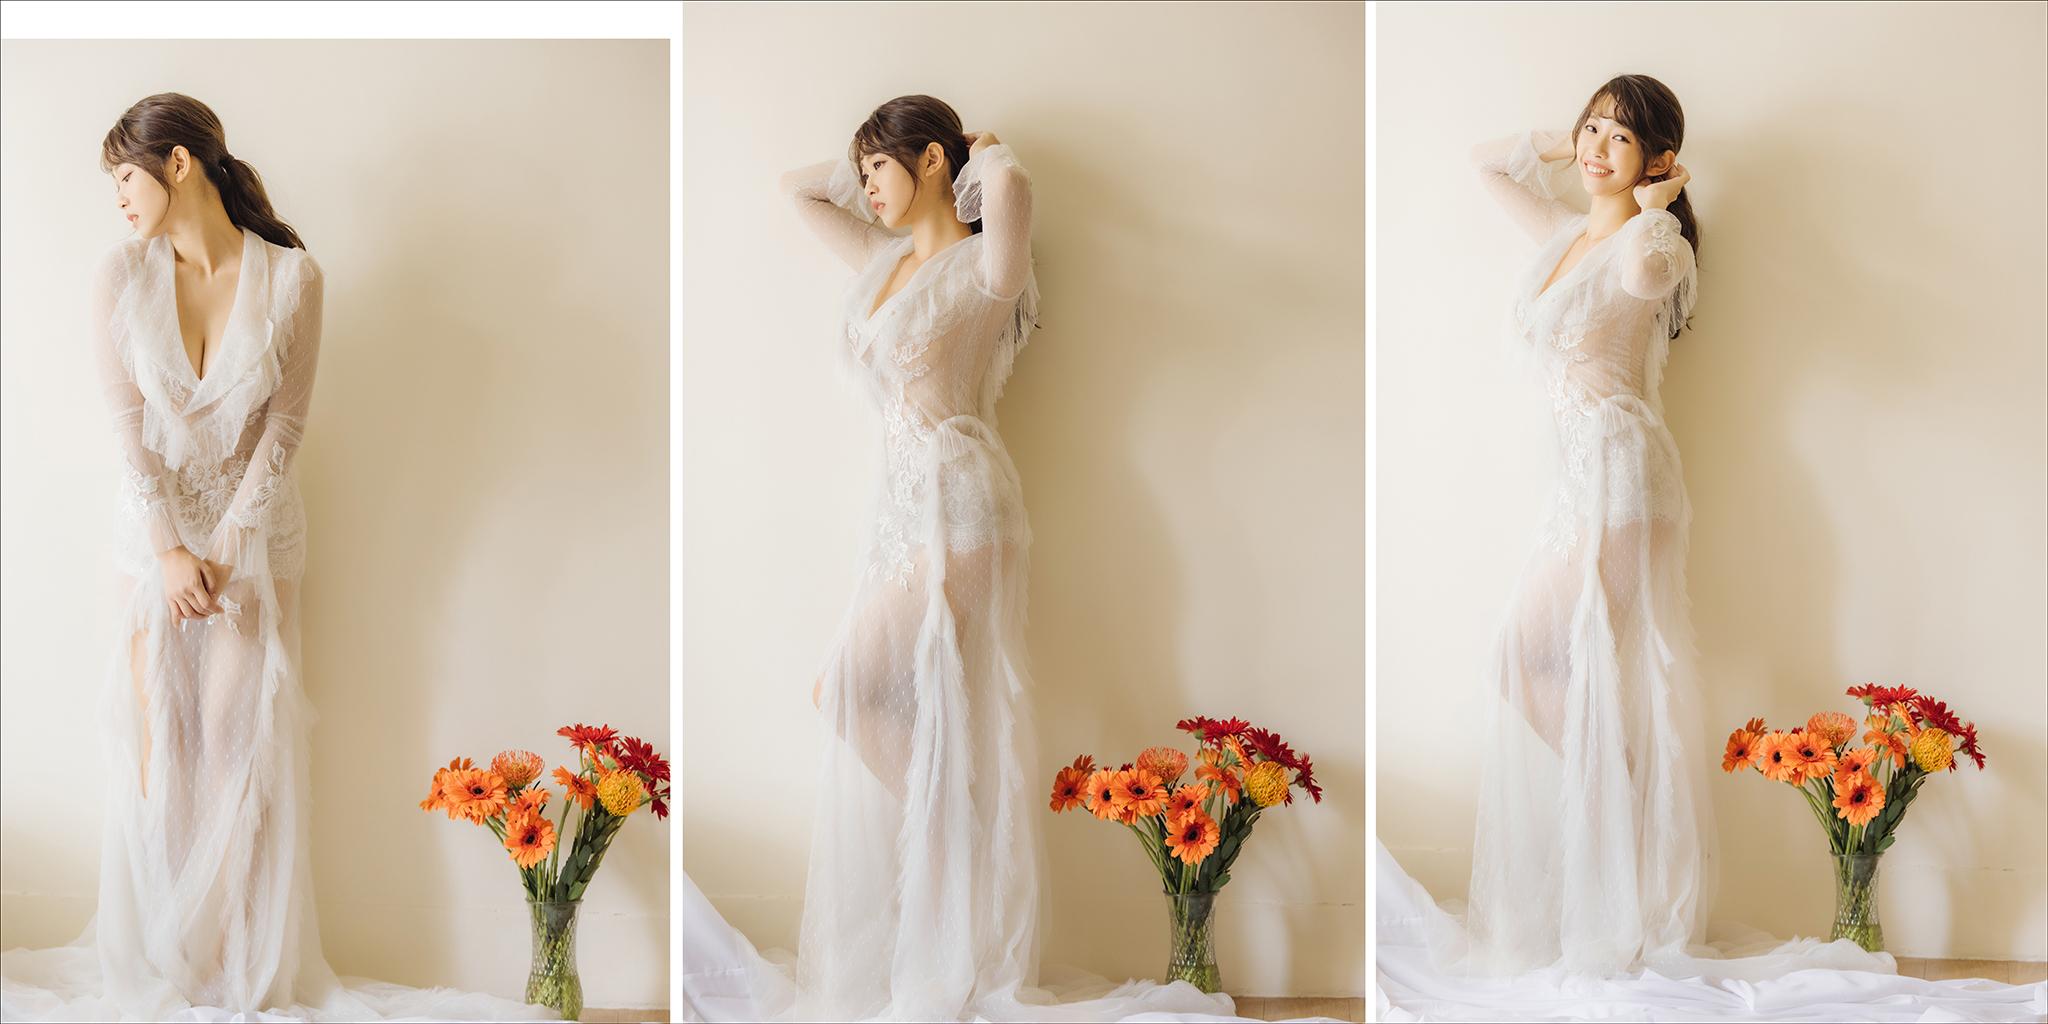 51576639837 bea023f5ce o - 【自主婚紗】+江jiang+